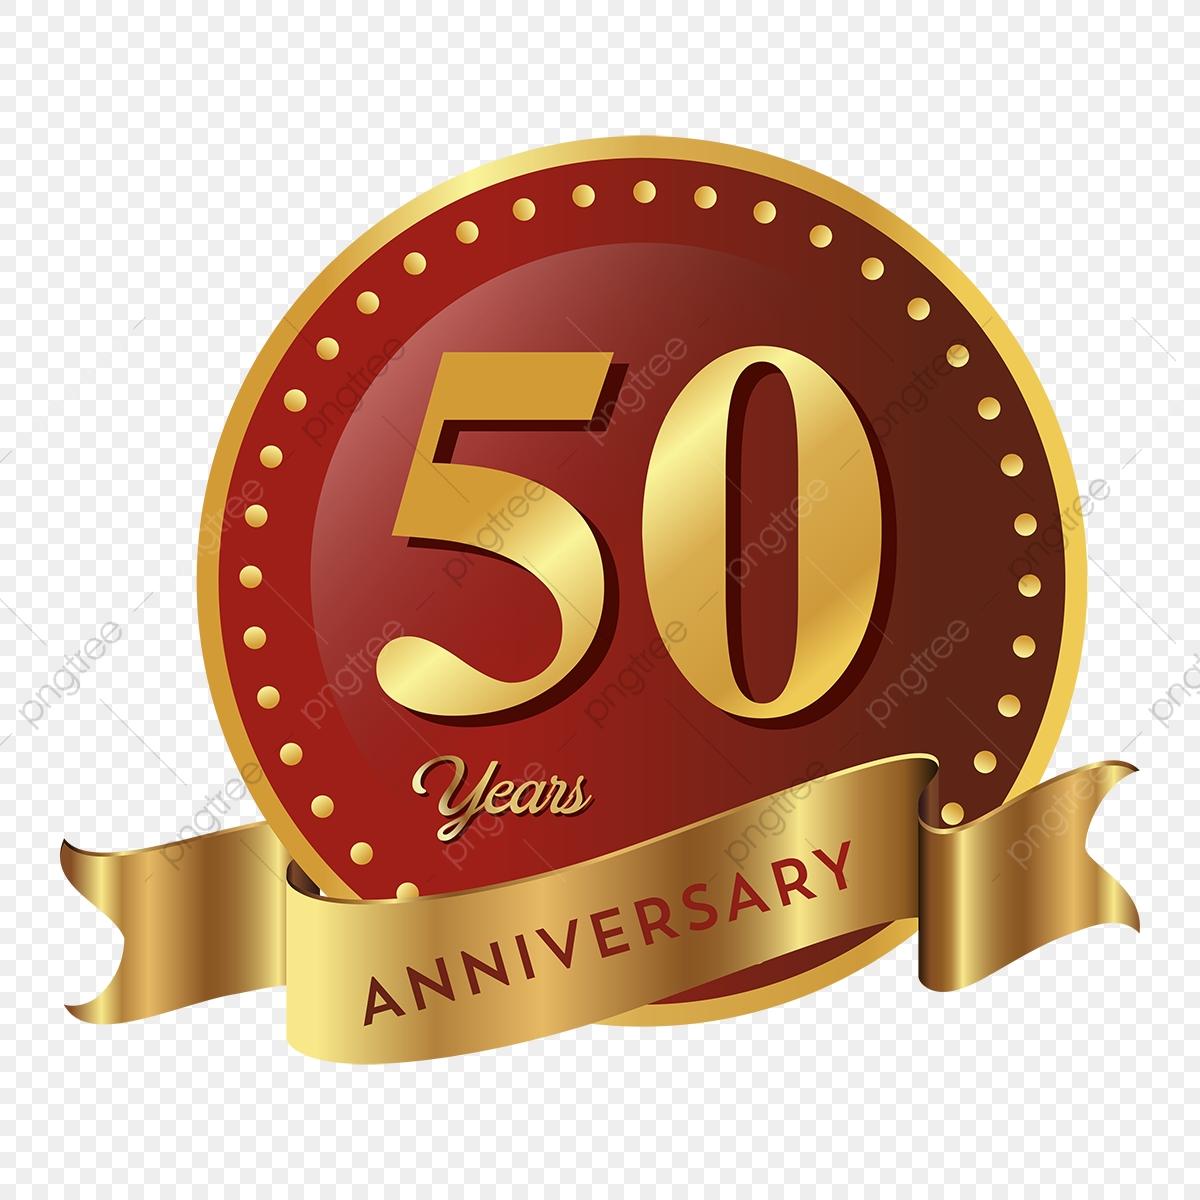 50th Anniversary Badge Icon, Anniversary, 50 Anniversary, Badge PNG.